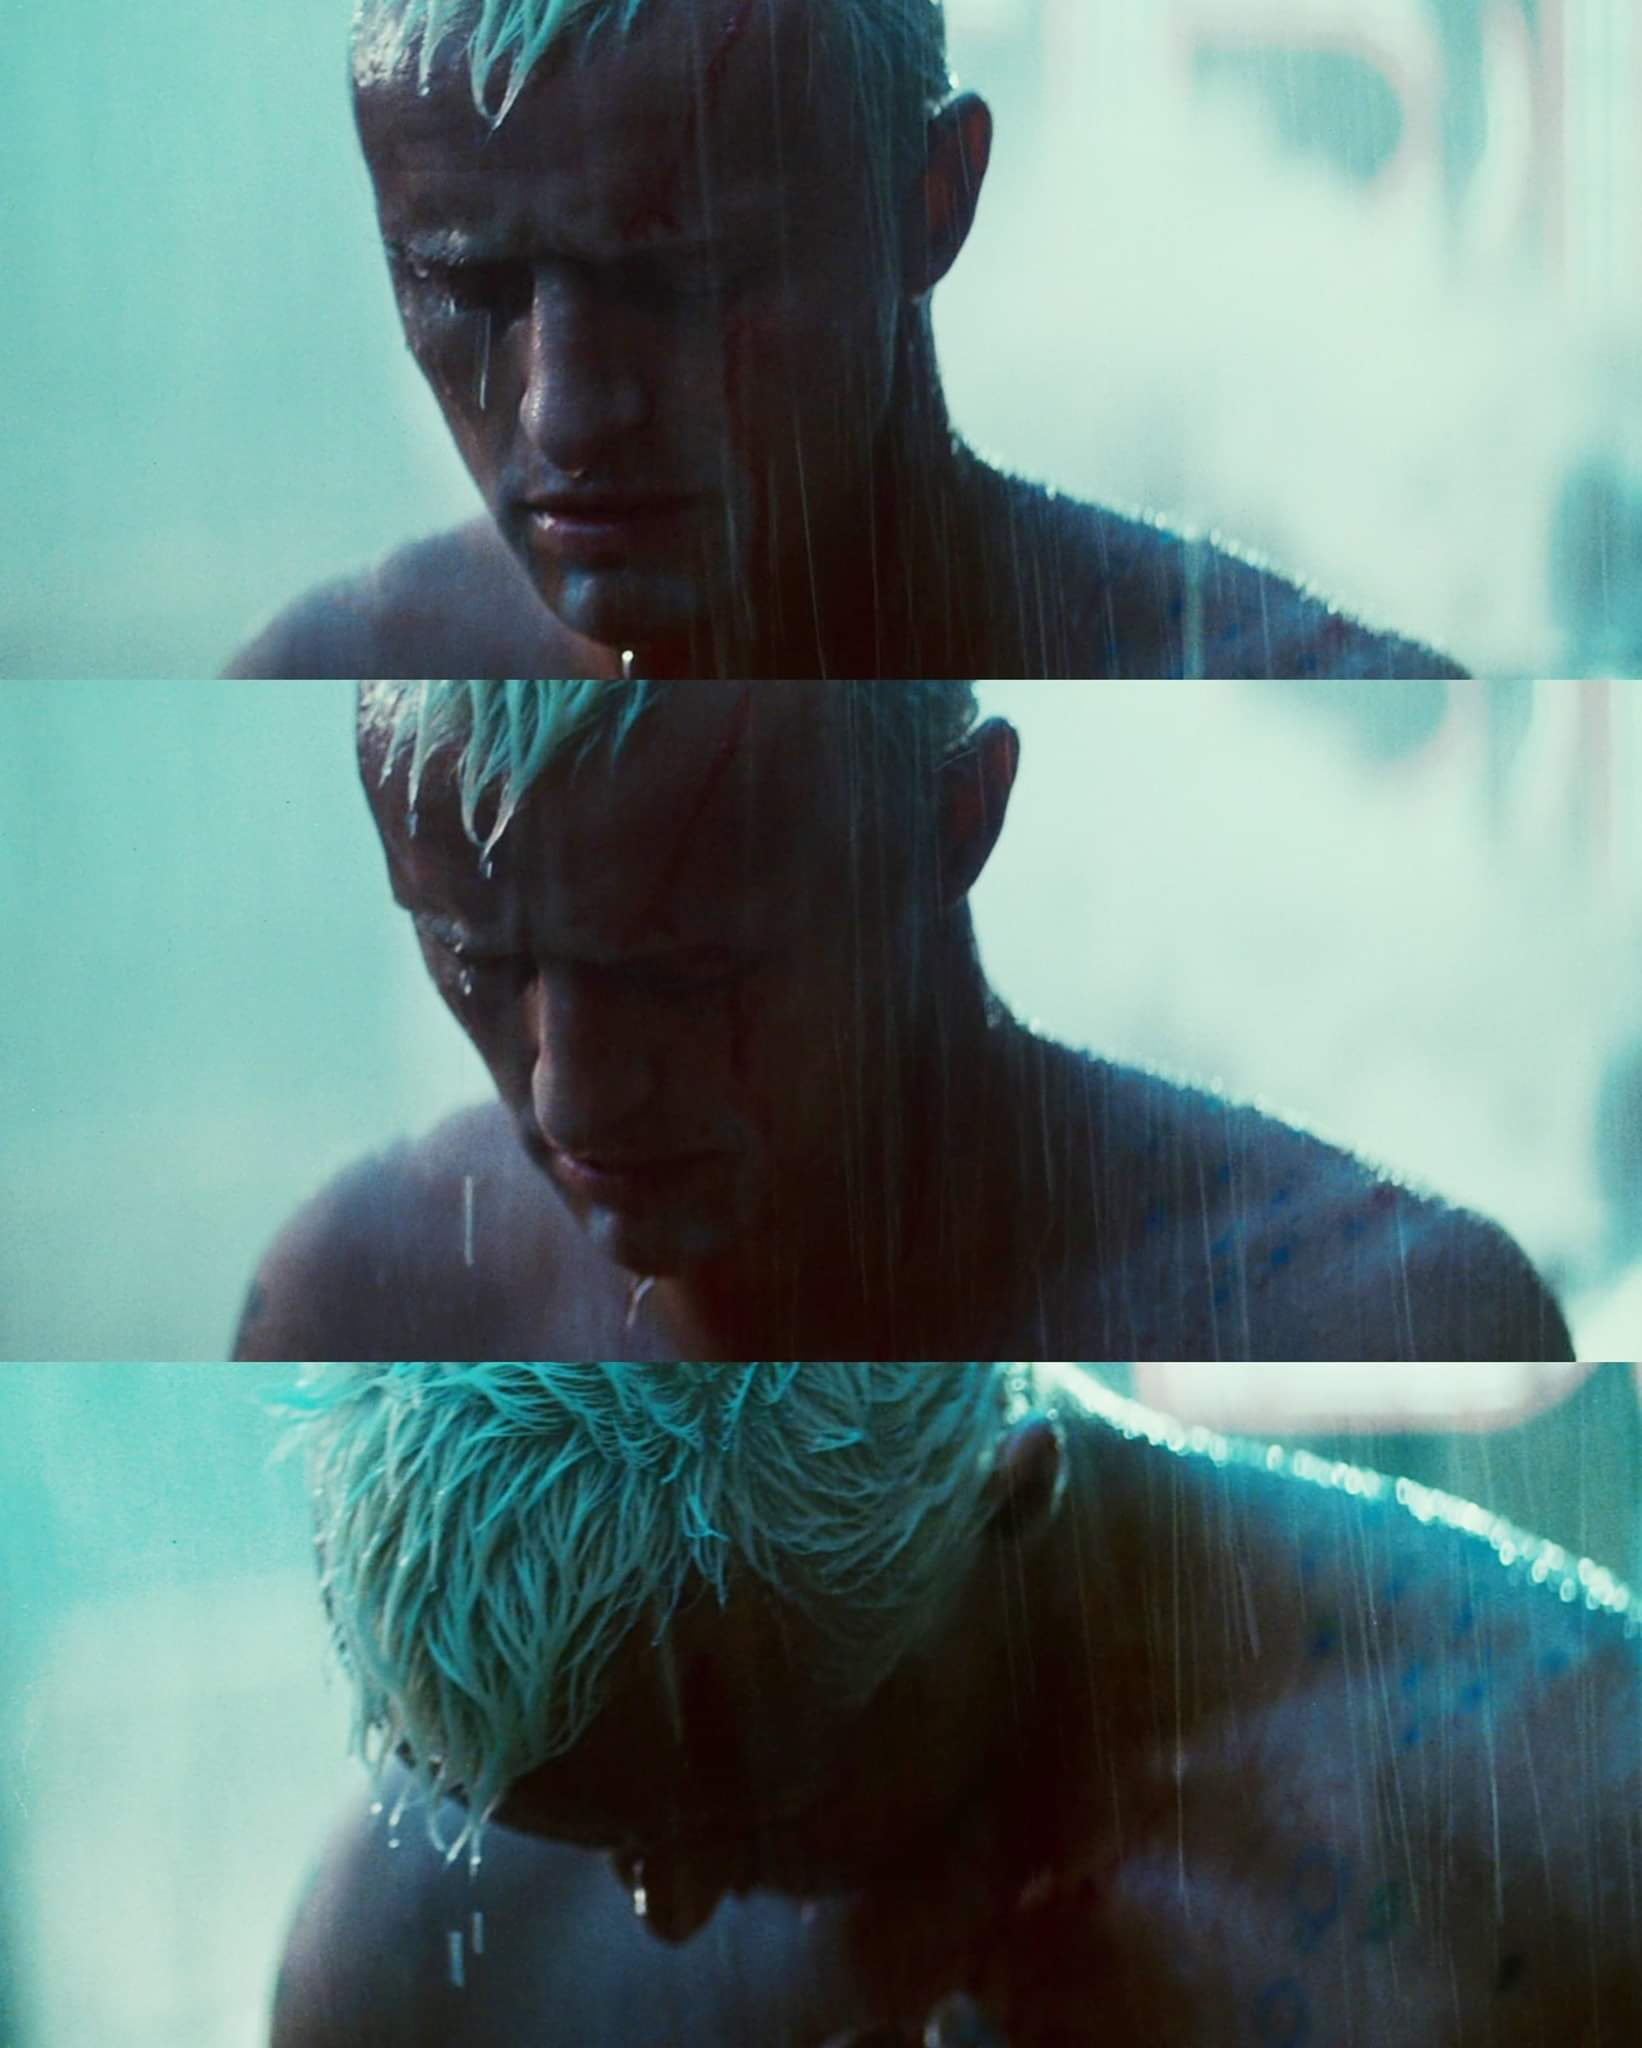 A heartbroken Roy Batty weeps as his life comes to an end.jpg